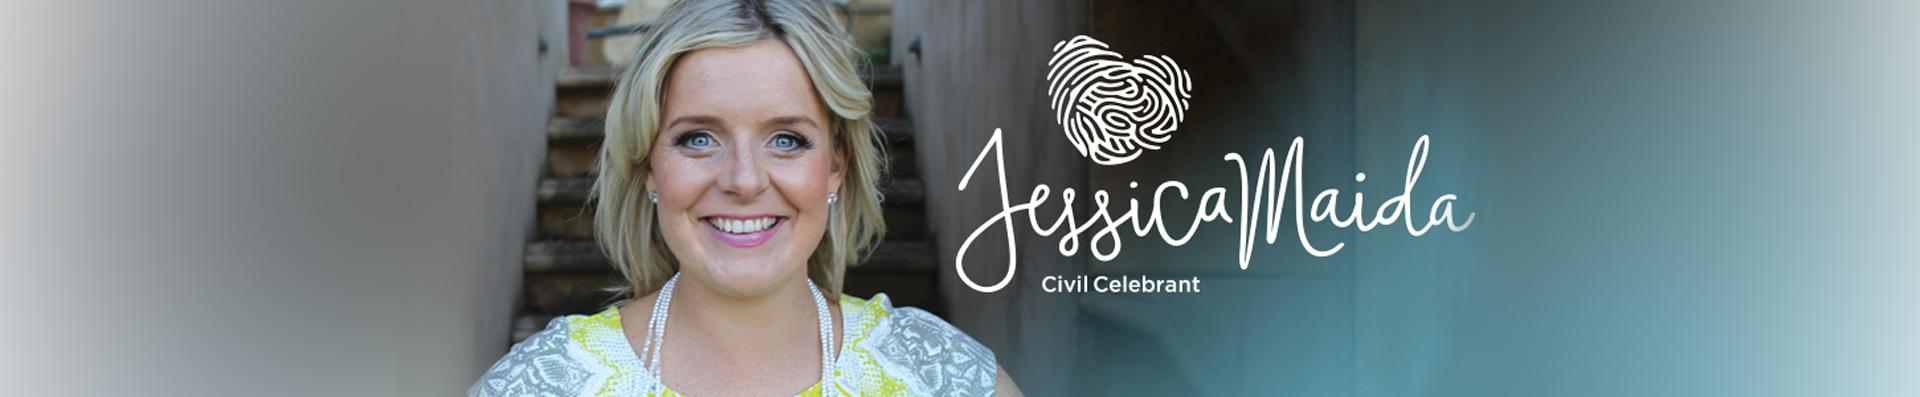 Jessica Maida - Civil Celebrant Adelaide South Australia